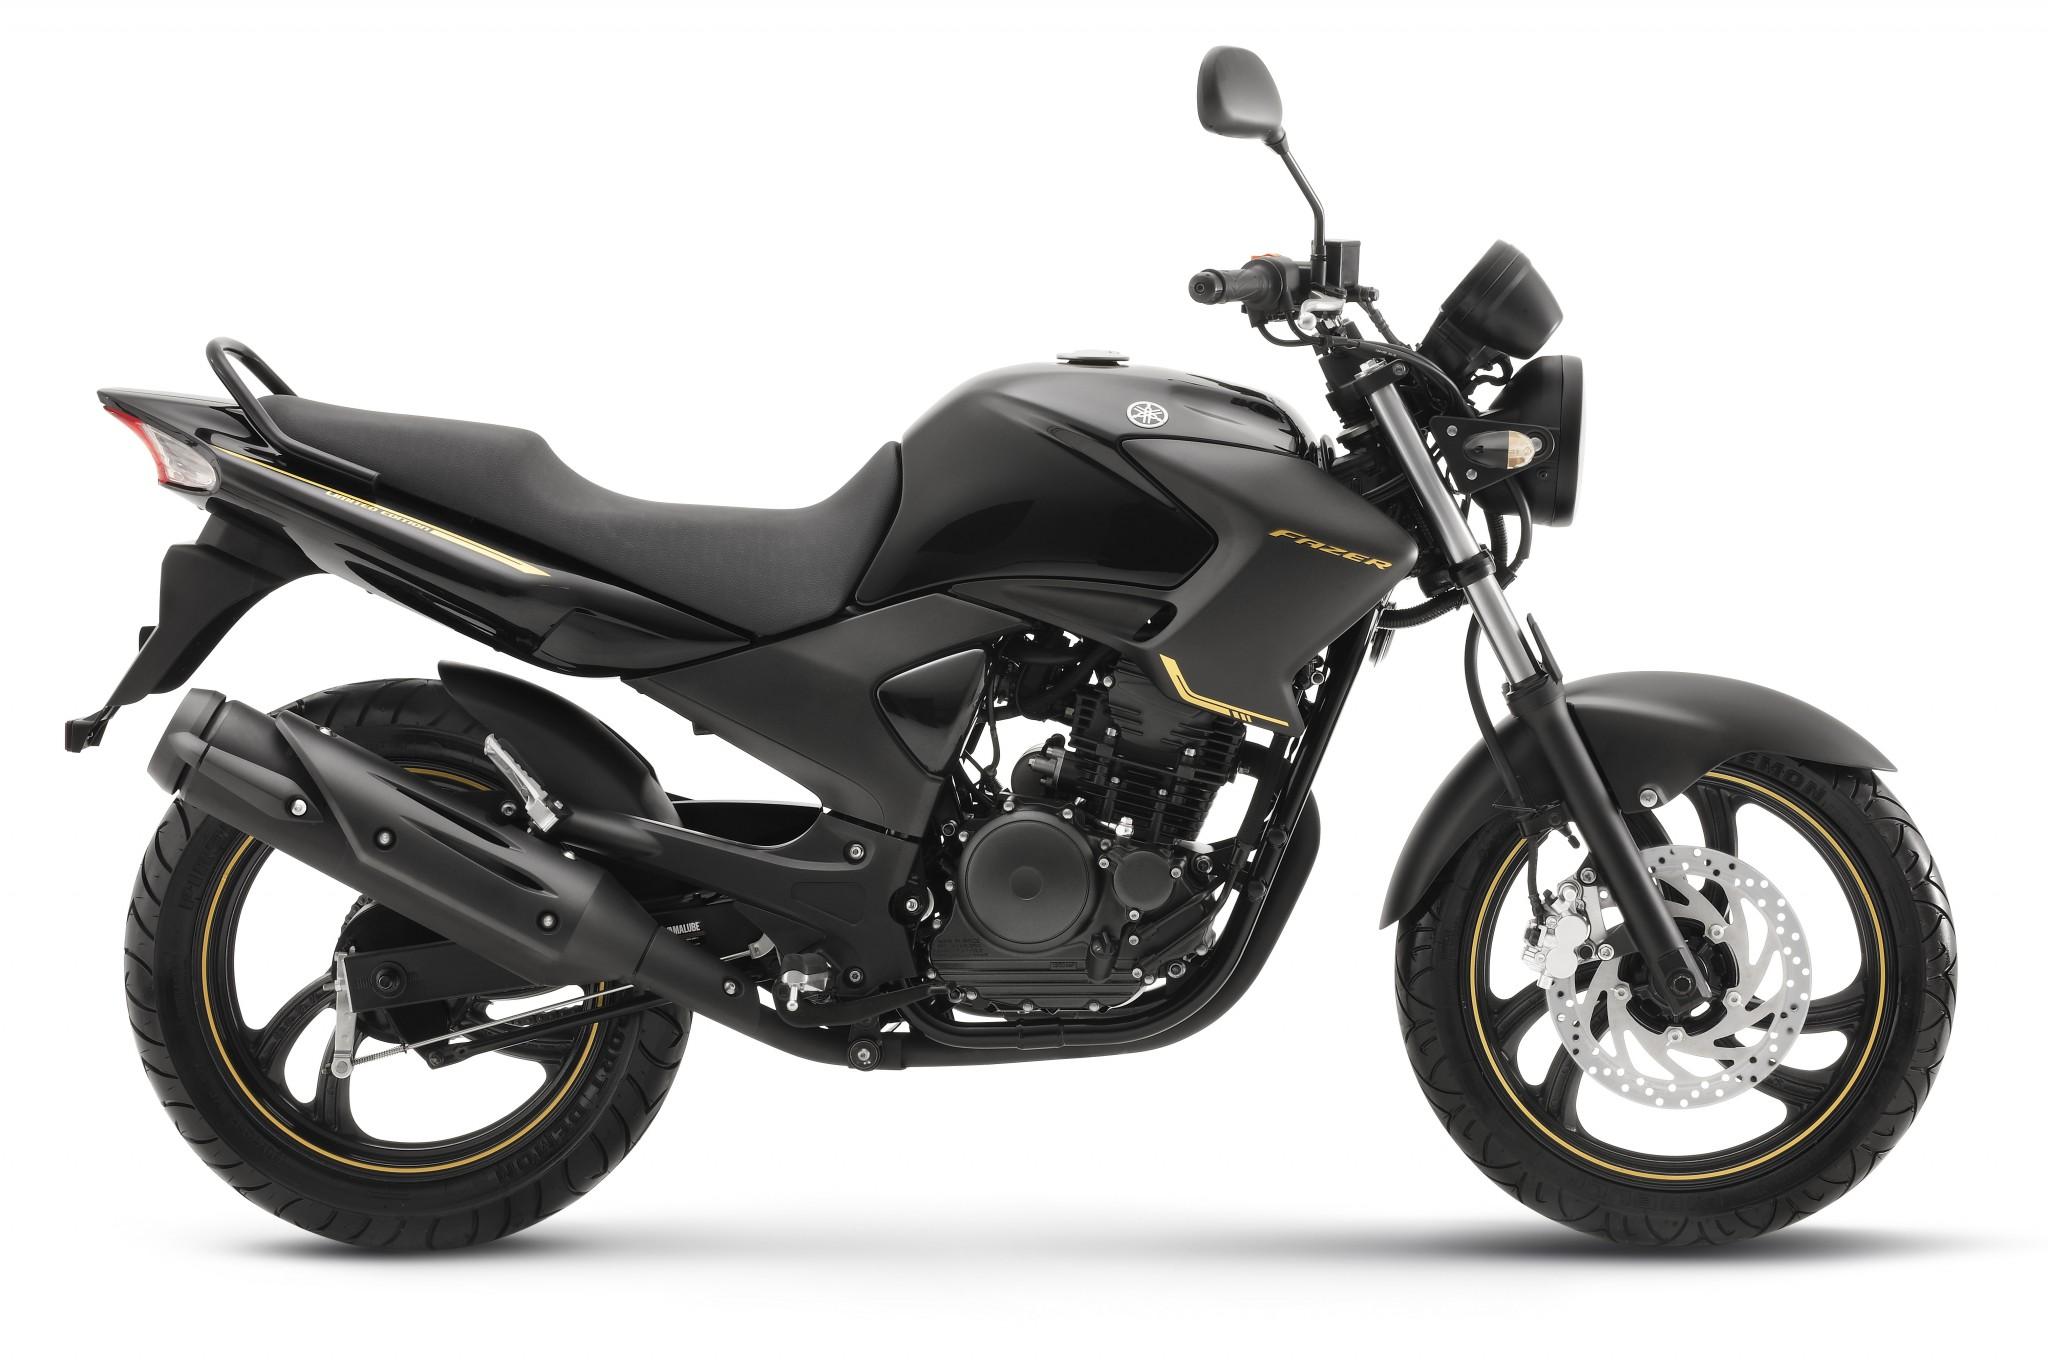 yamaha lan a ys250 fazer limited 2010 motos blog. Black Bedroom Furniture Sets. Home Design Ideas